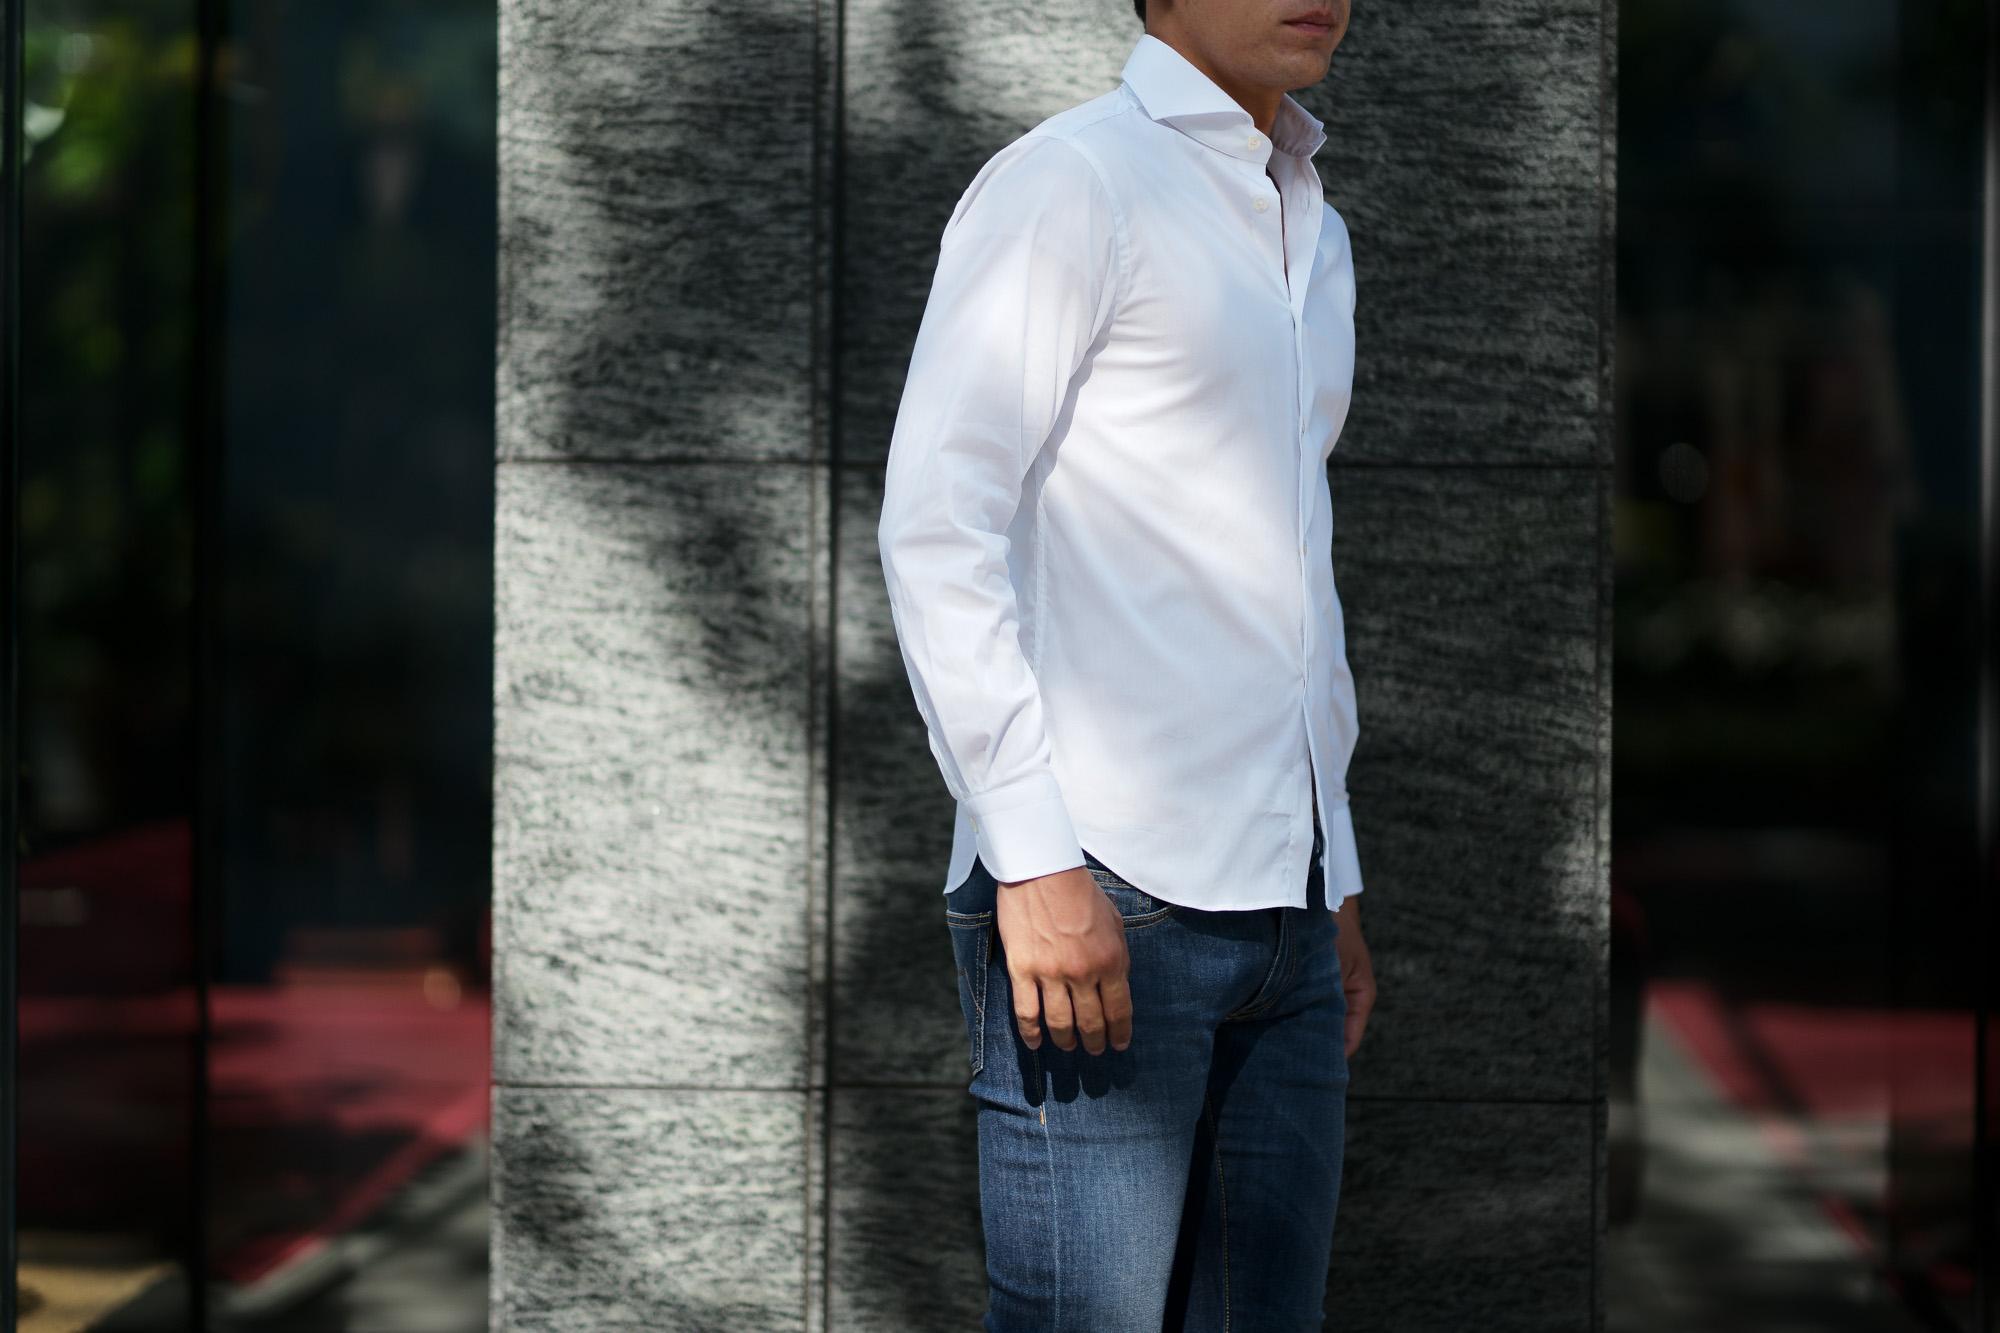 Cuervo (クエルボ) Sartoria Collection (サルトリア コレクション) Pier(ピエル) STRETCH COTTON ストレッチコットン シャツ WHITE(ホワイト) MADE IN ITALY (イタリア製) 2019 春夏新作 イタリアシャツ 愛知 名古屋 altoediritto アルトエデリット